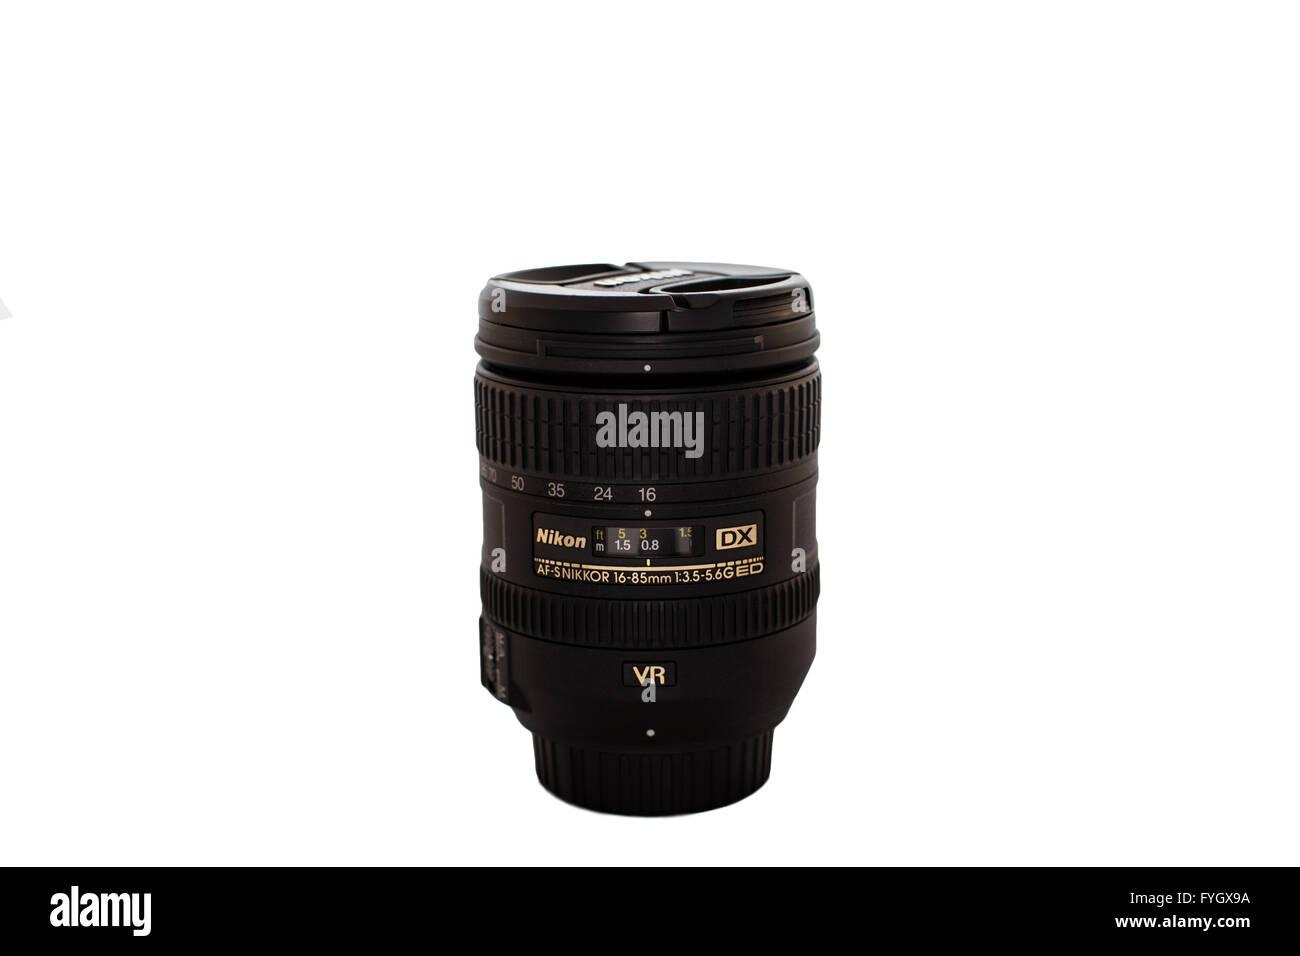 A row of Nikon Lens' - Stock Image